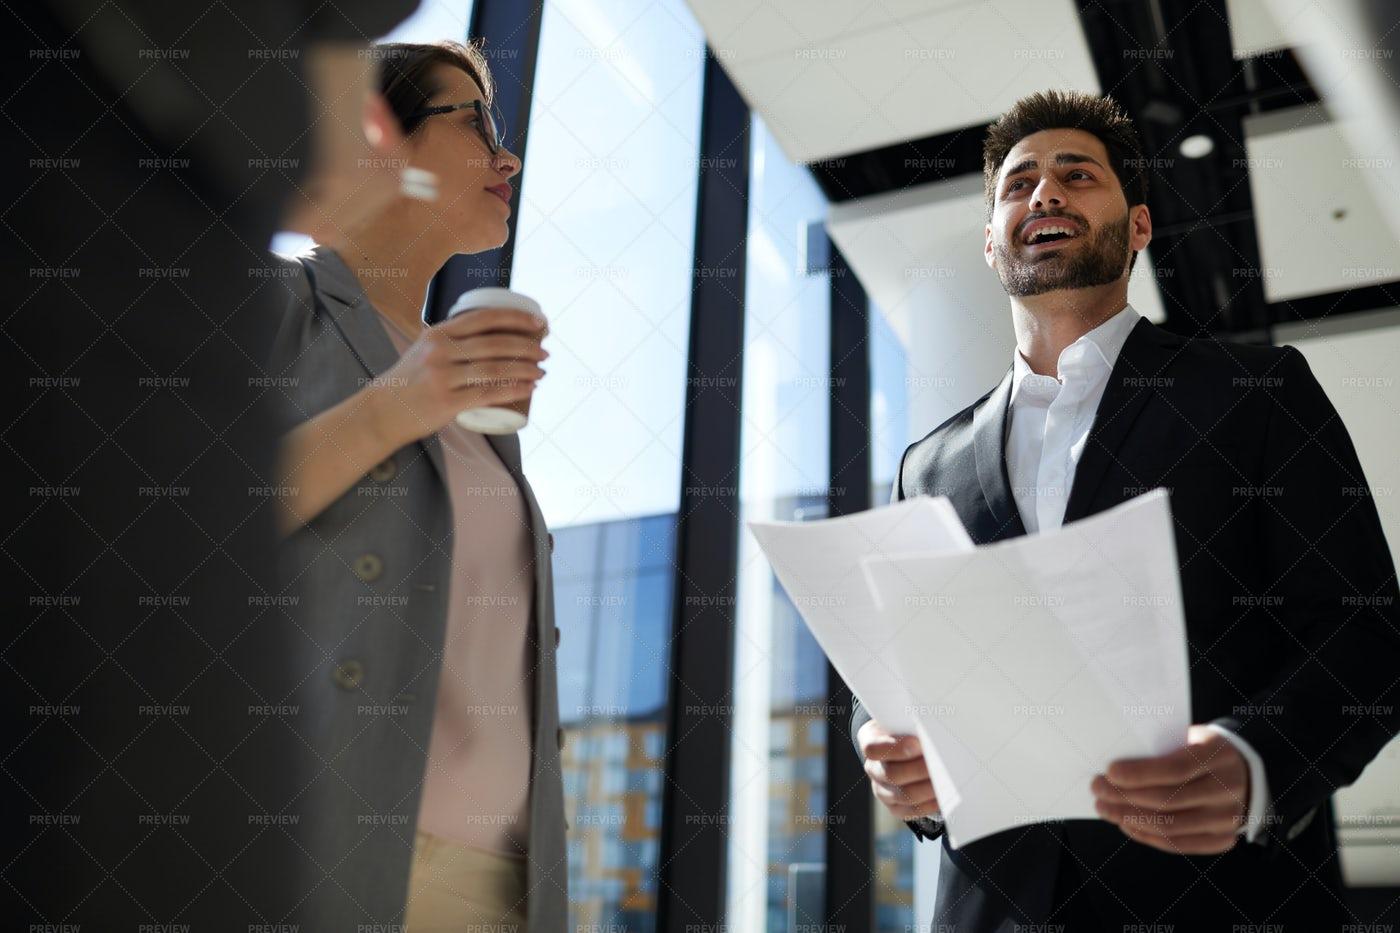 Cheerful Businessman Reading Report...: Stock Photos